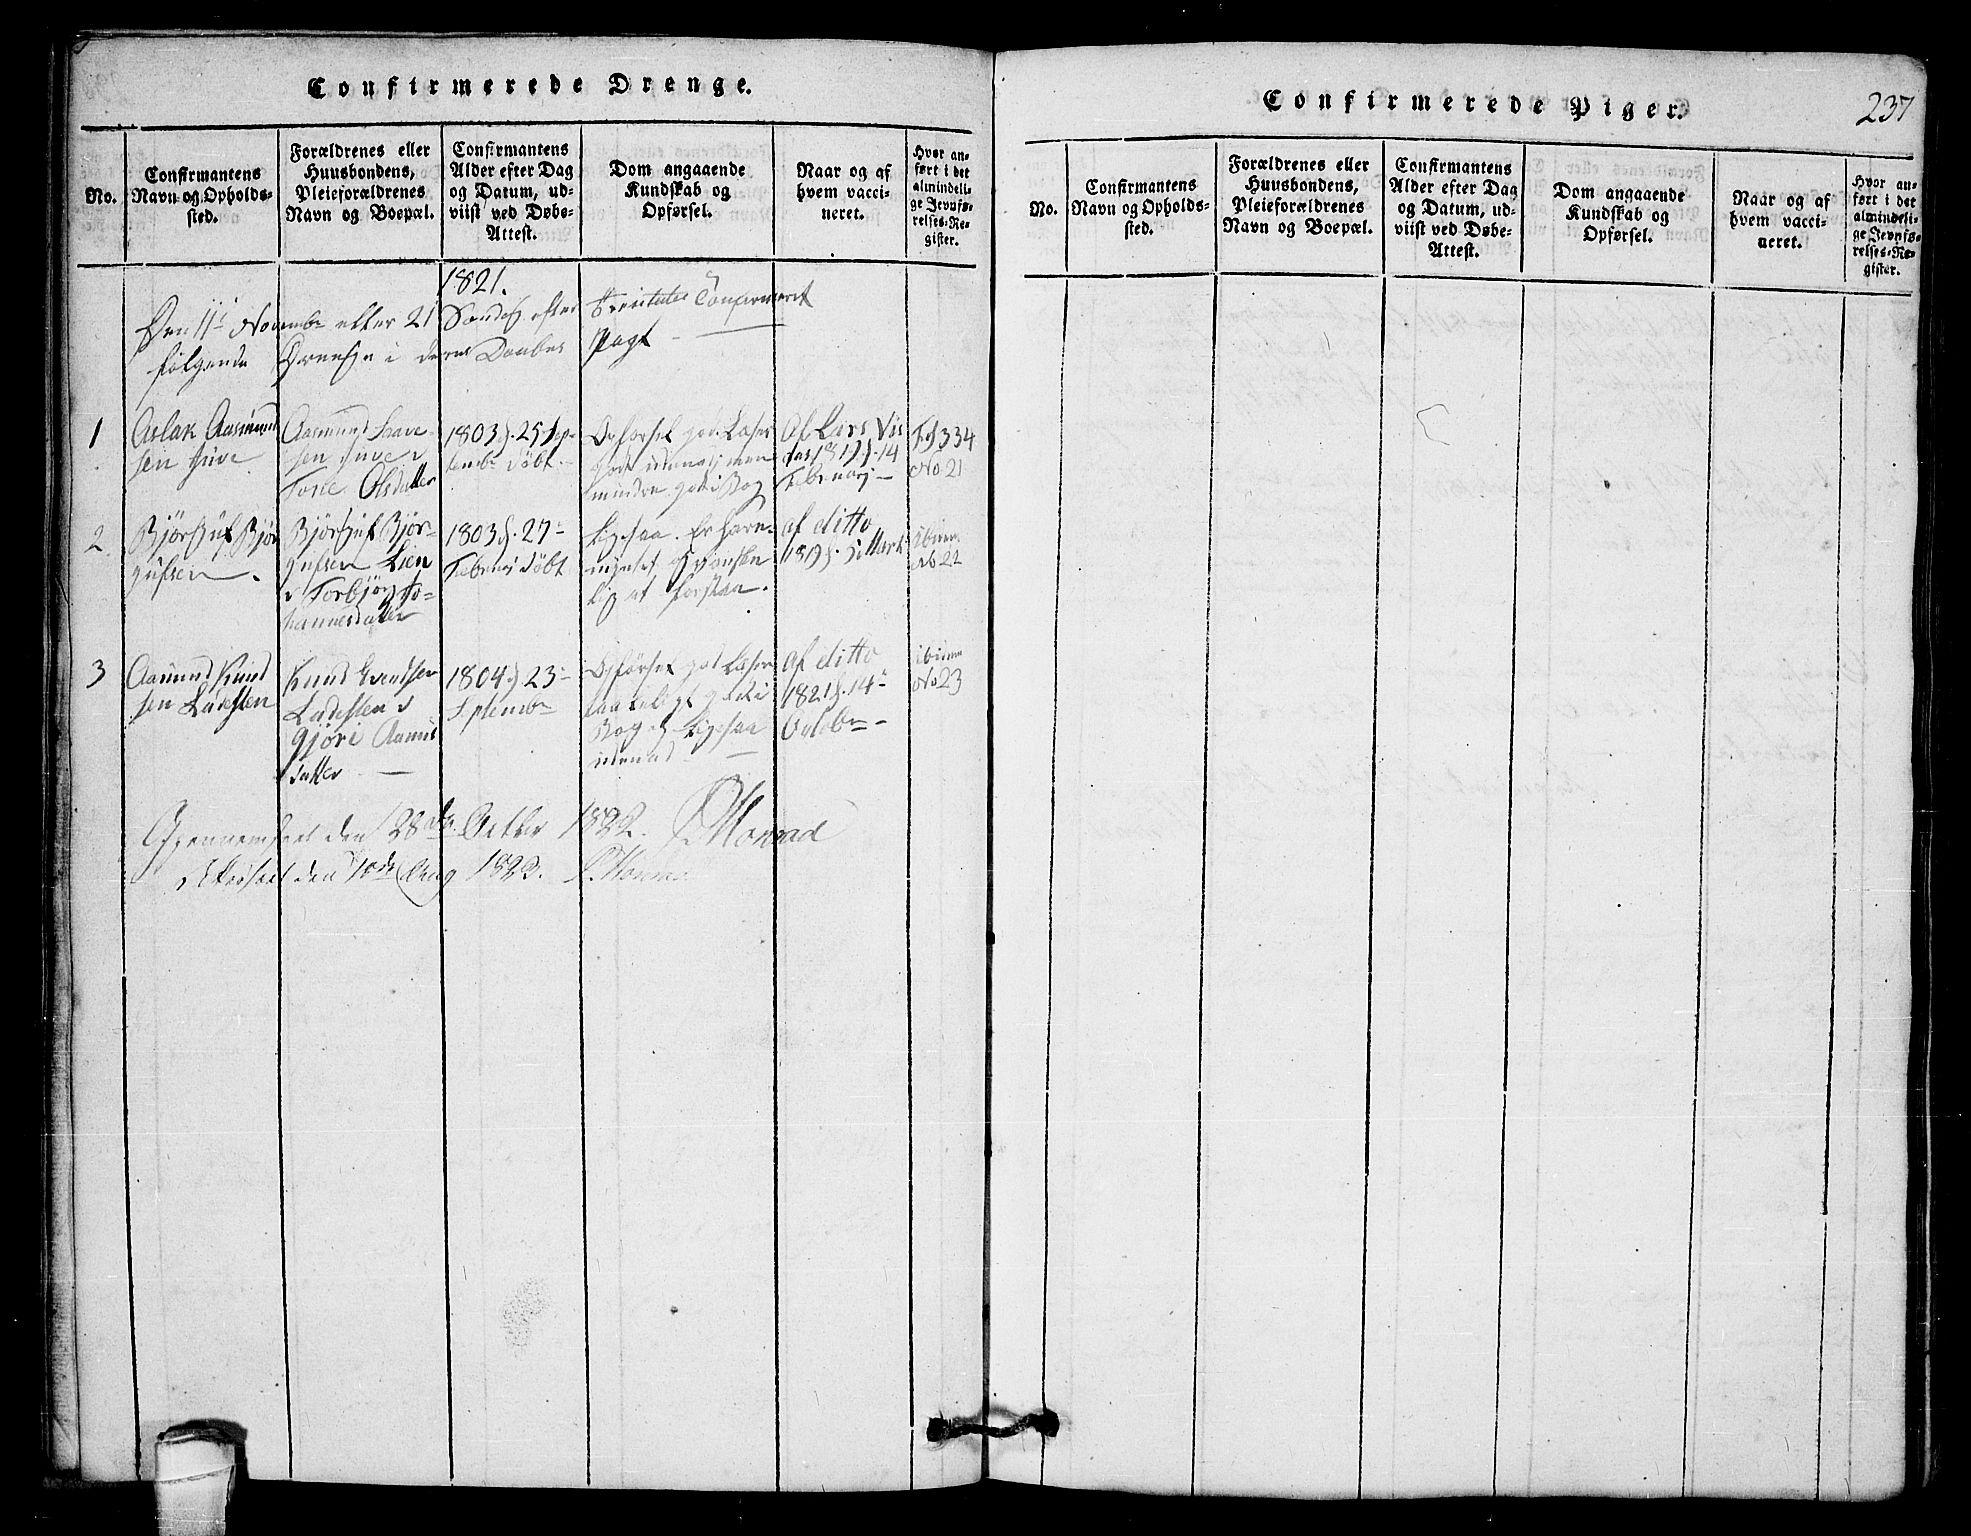 SAKO, Lårdal kirkebøker, G/Gb/L0001: Klokkerbok nr. II 1, 1815-1865, s. 237